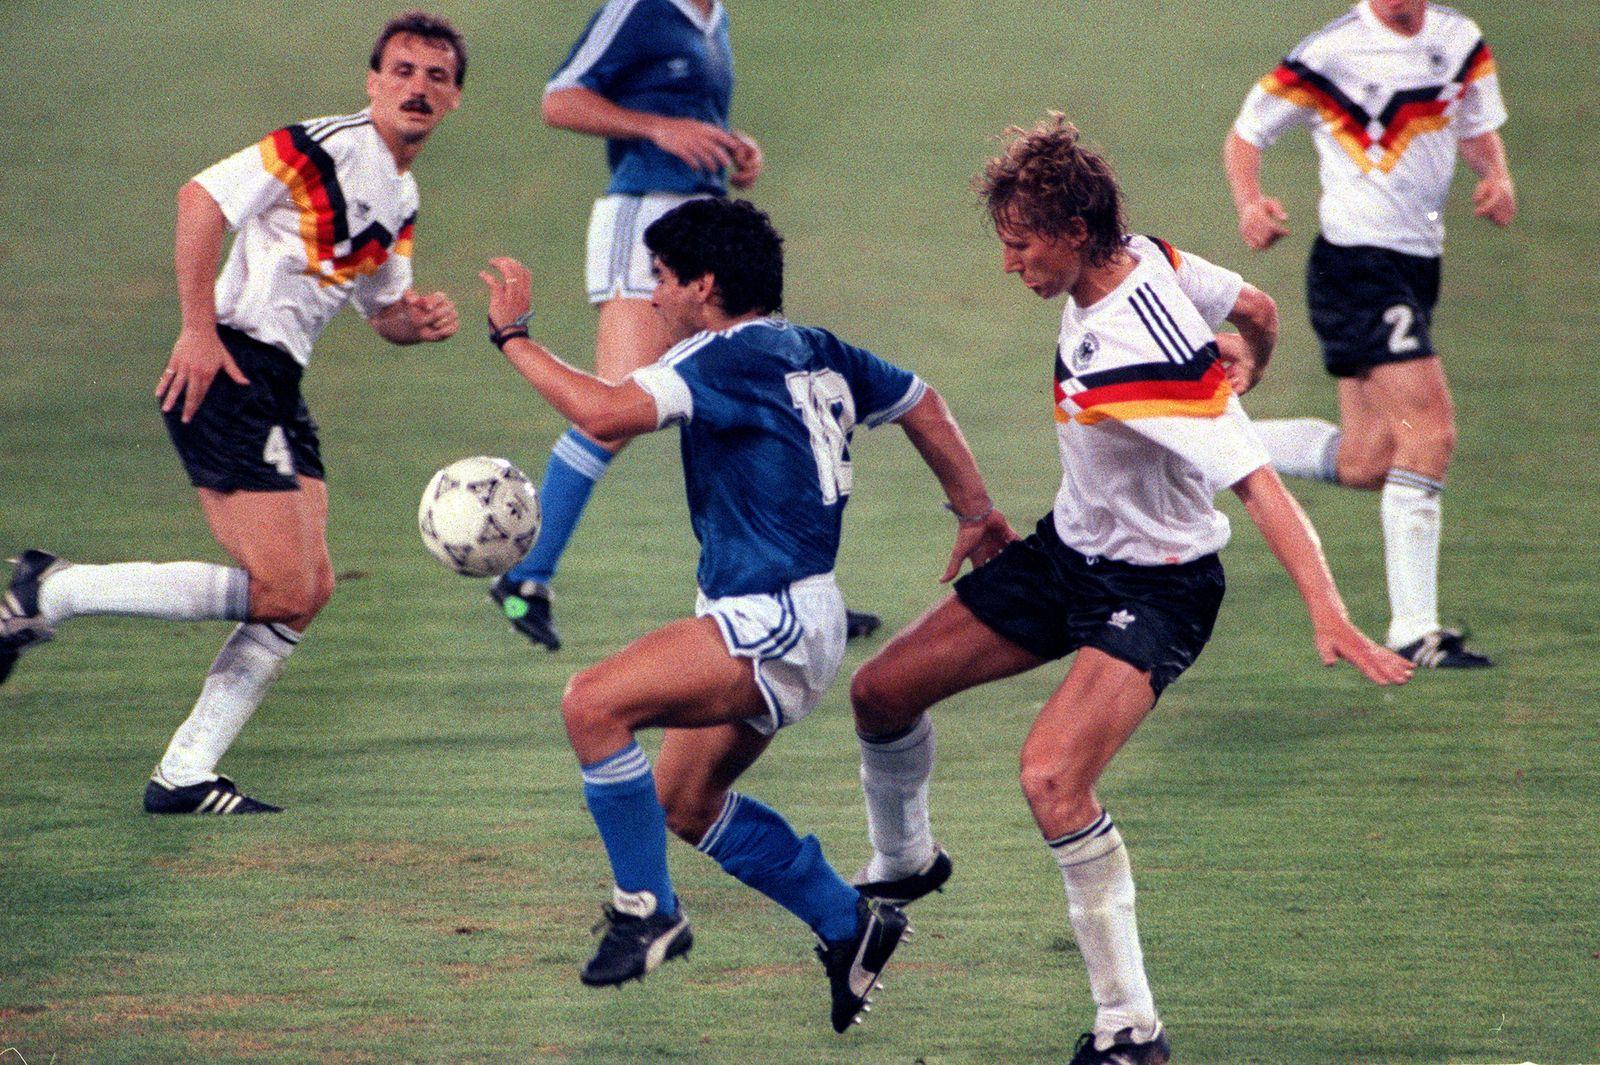 DIEGO MARADONA, GUIDO BUCHWALD MONDIALI ITALIA 1990 GERMANIA OVEST-ARGENTINA 1-0 FINALE PUBLICATIONxNOTxINxITA